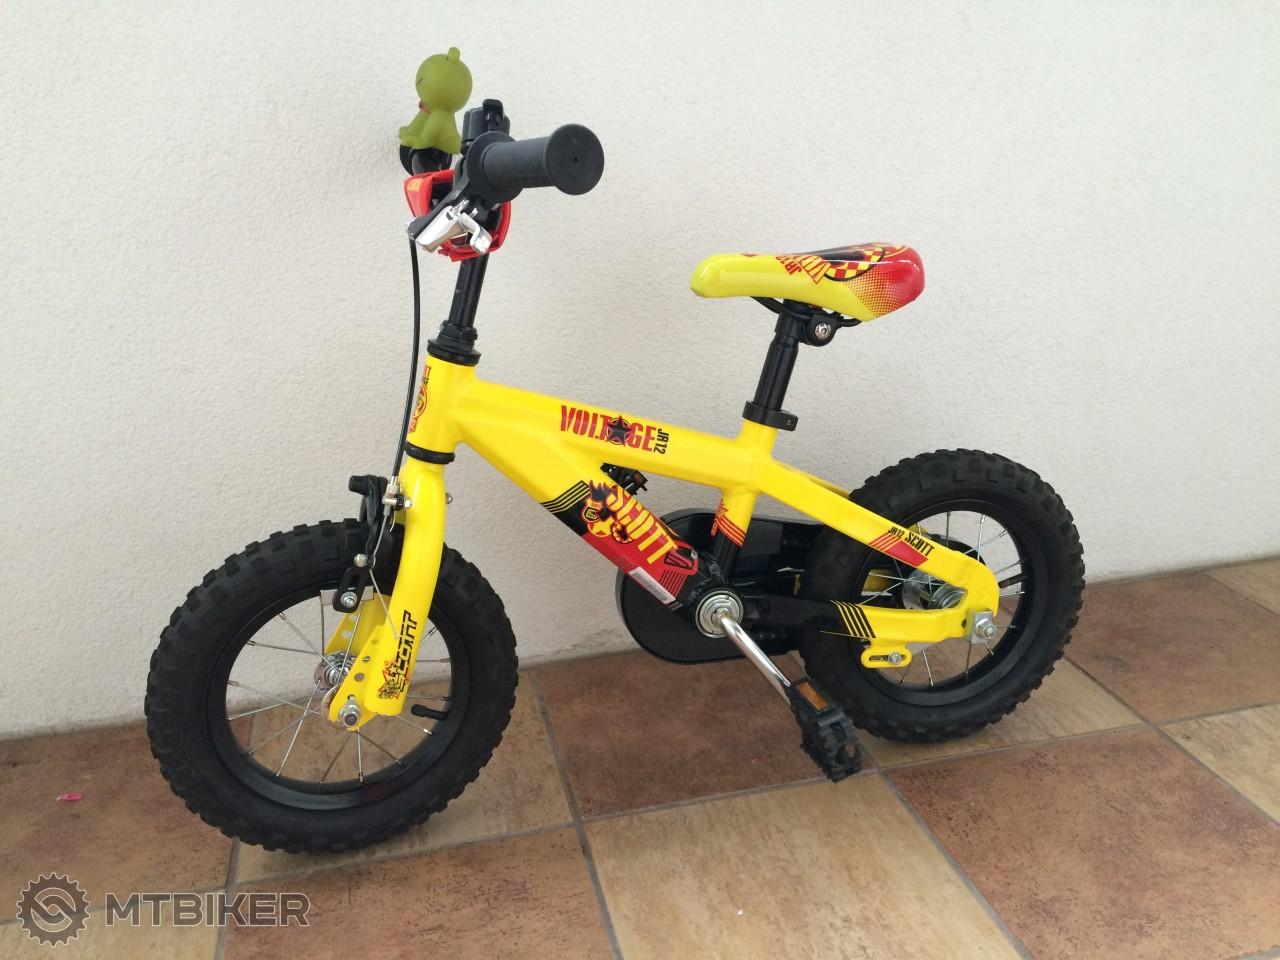 e808811a9144b Detský Bicykel Scott Voltage Jr 12 - Bicykle - Pevné a hardtail - Bazár  MTBIKER